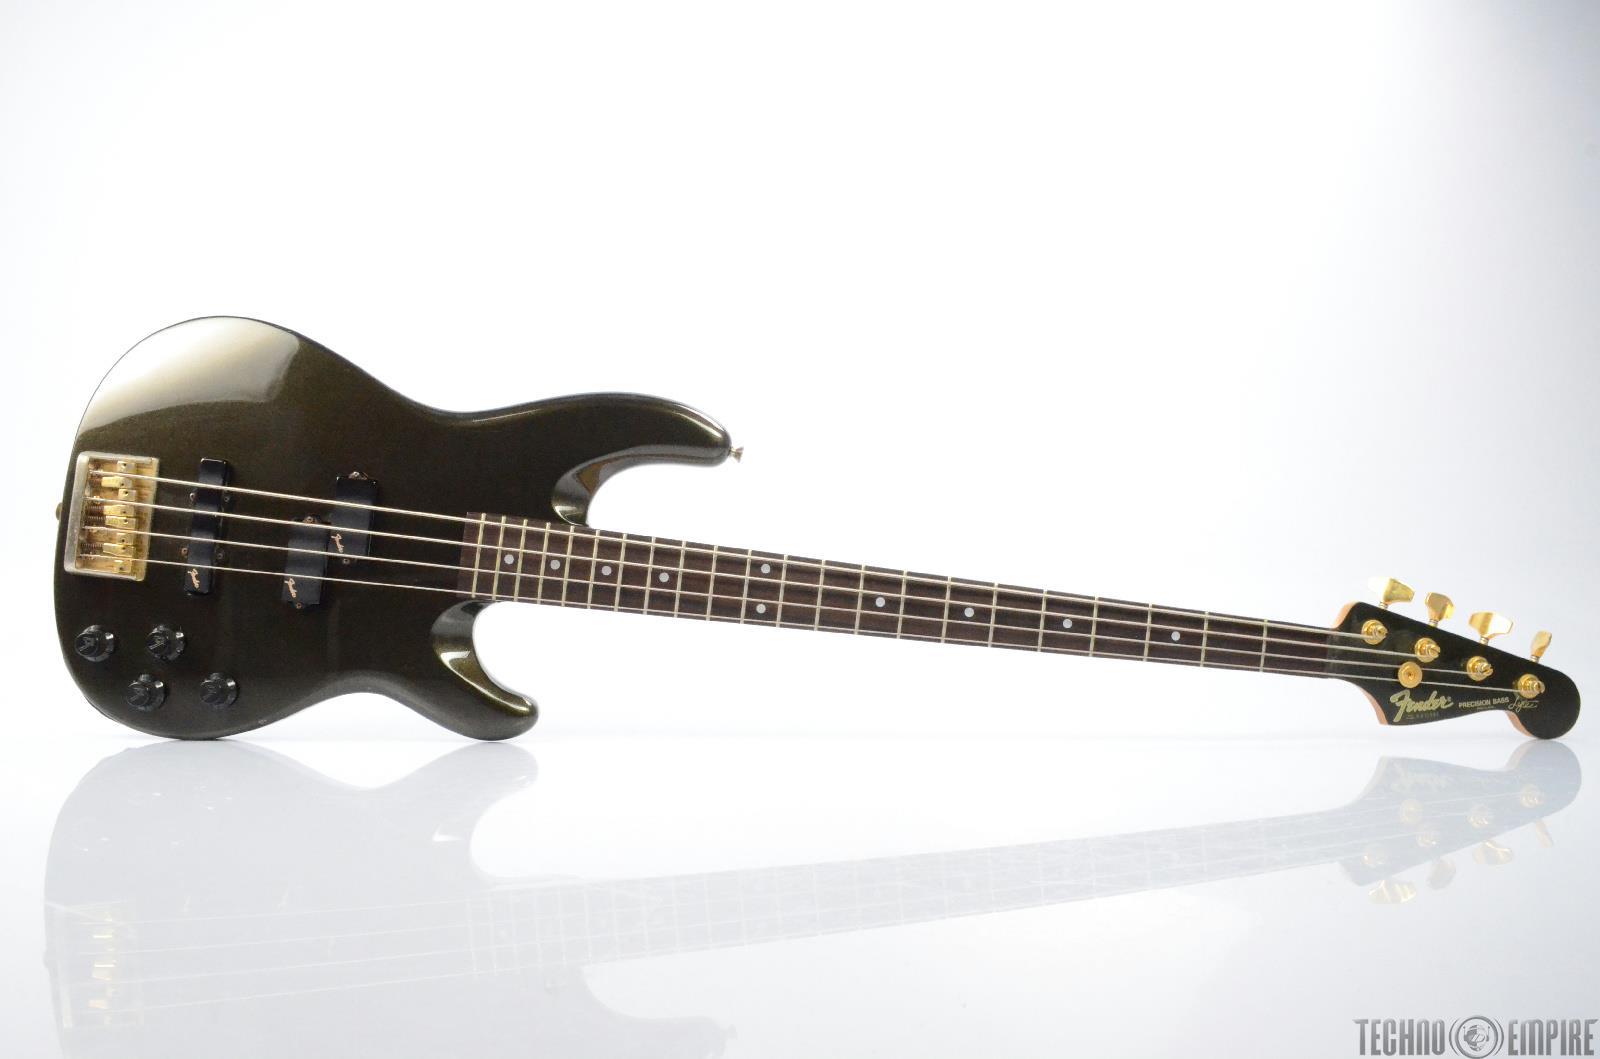 fender precision bass lyte electric guitar w hard case made in japan 26365 ebay. Black Bedroom Furniture Sets. Home Design Ideas